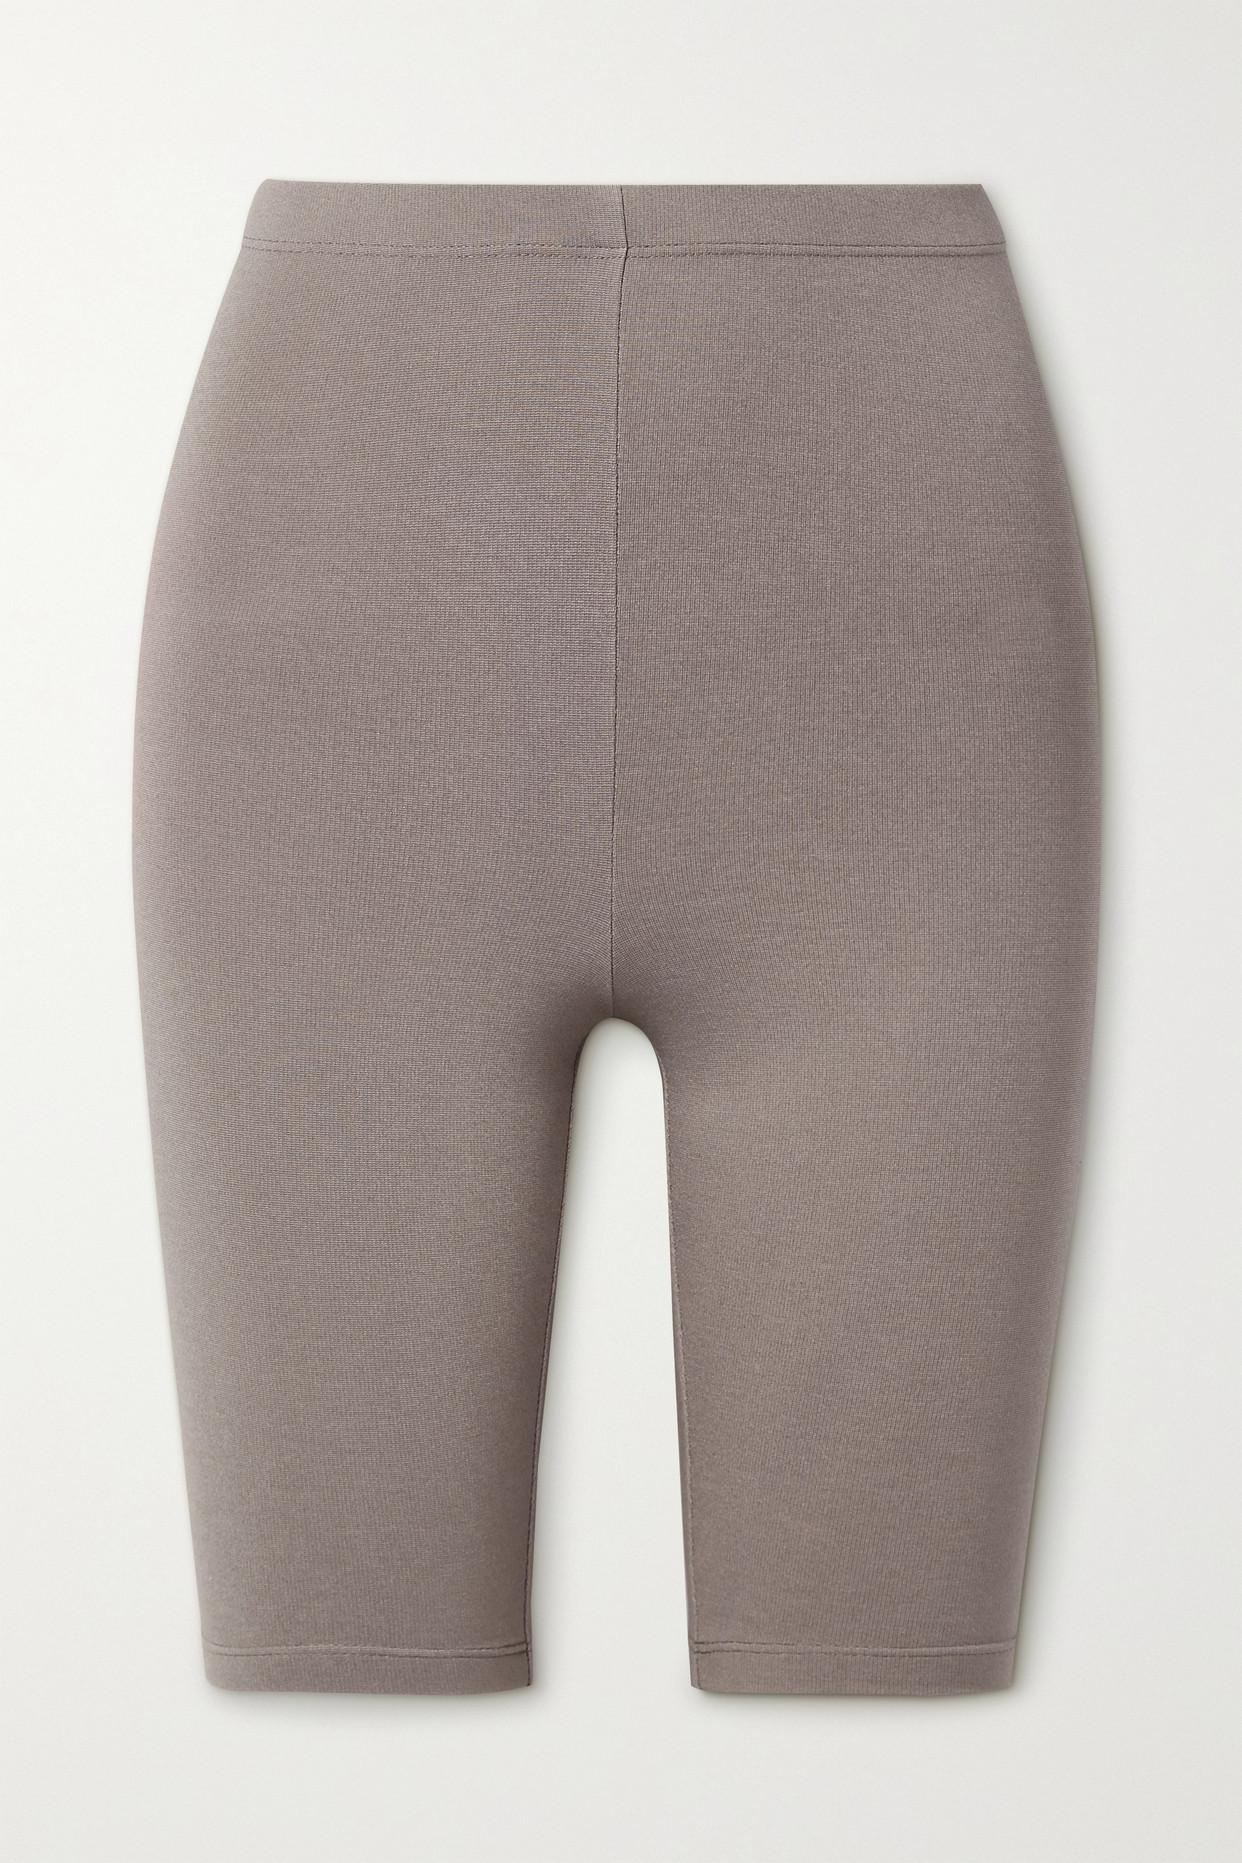 Sablyn Paulina Stretch-jersey Shorts In Neutrals